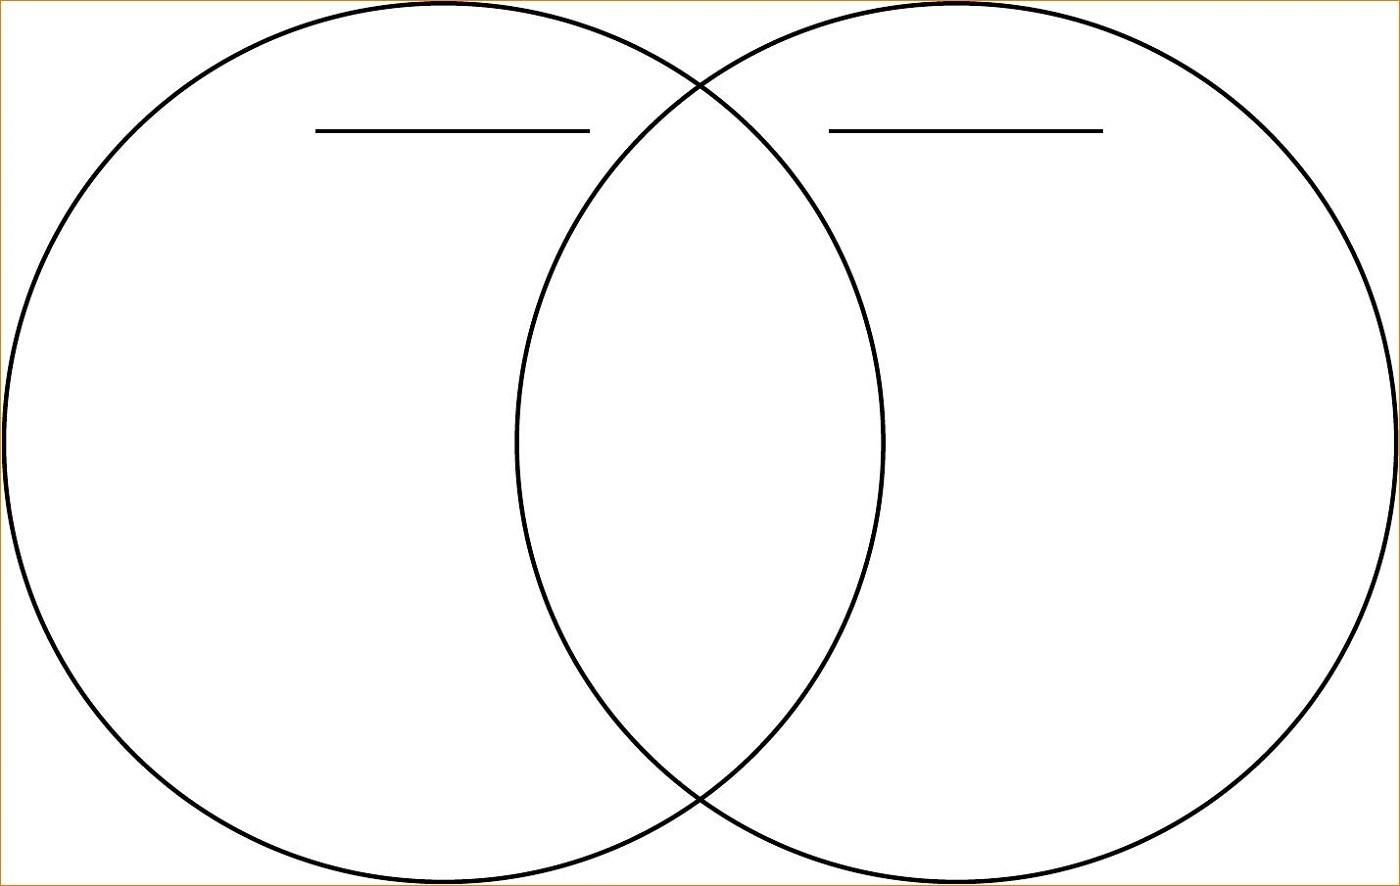 Venn Diagram | Diagram Link - Free Printable Venn Diagram